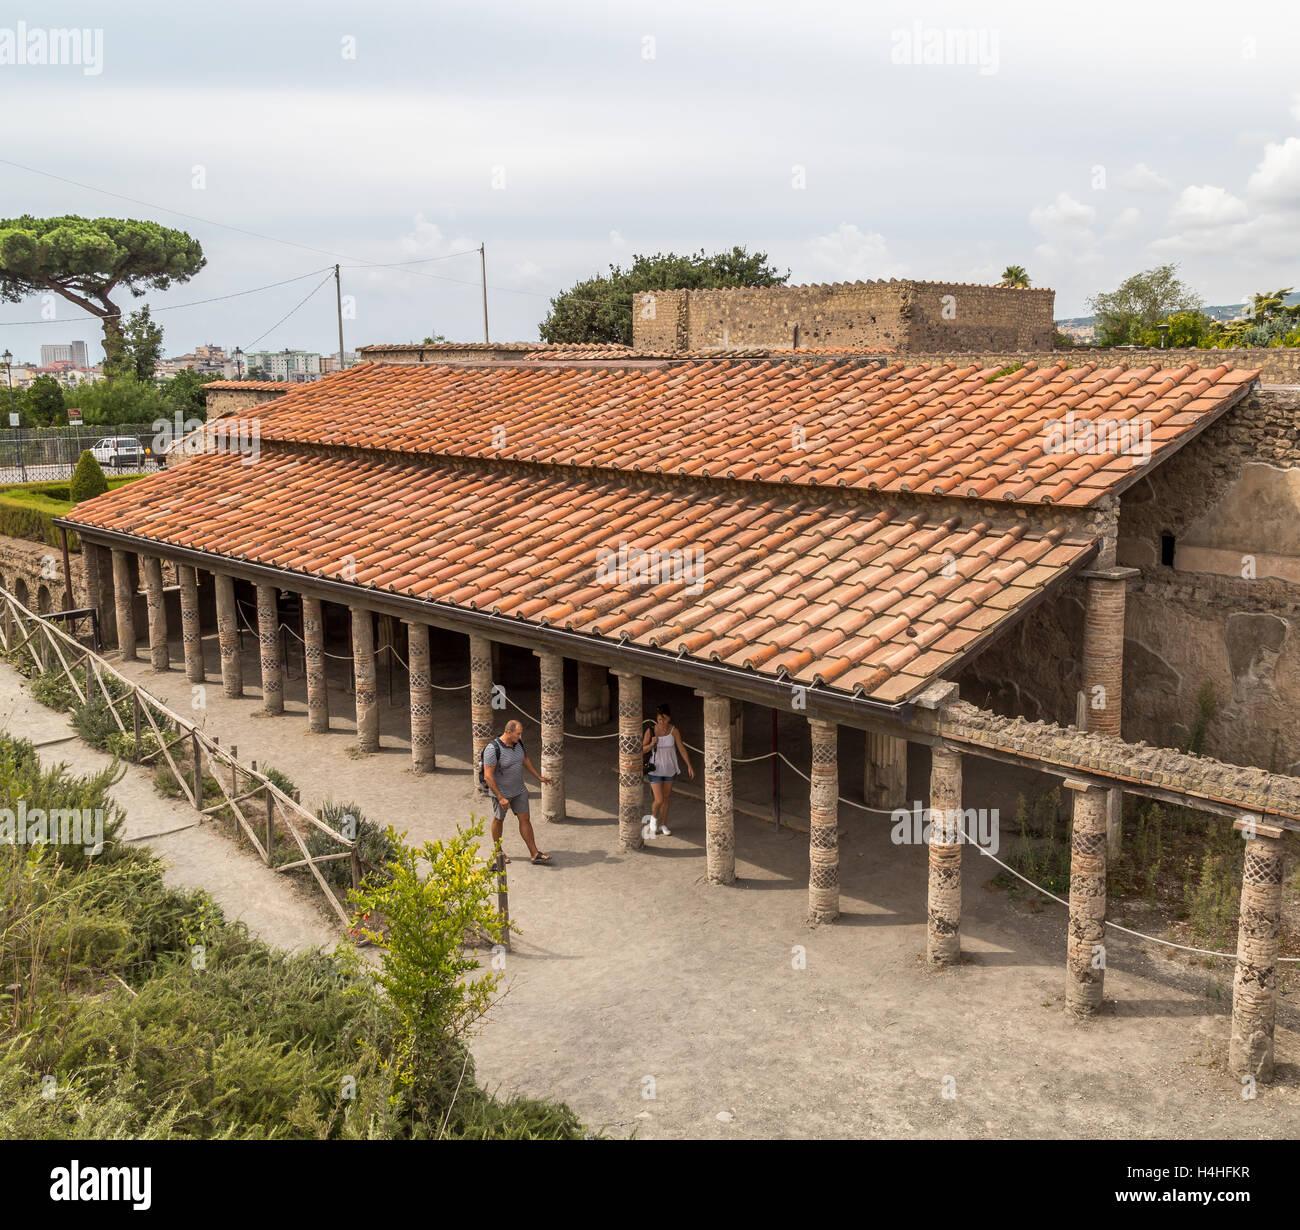 The Villa of the Mysteries, Pompeii, Italy - Stock Image